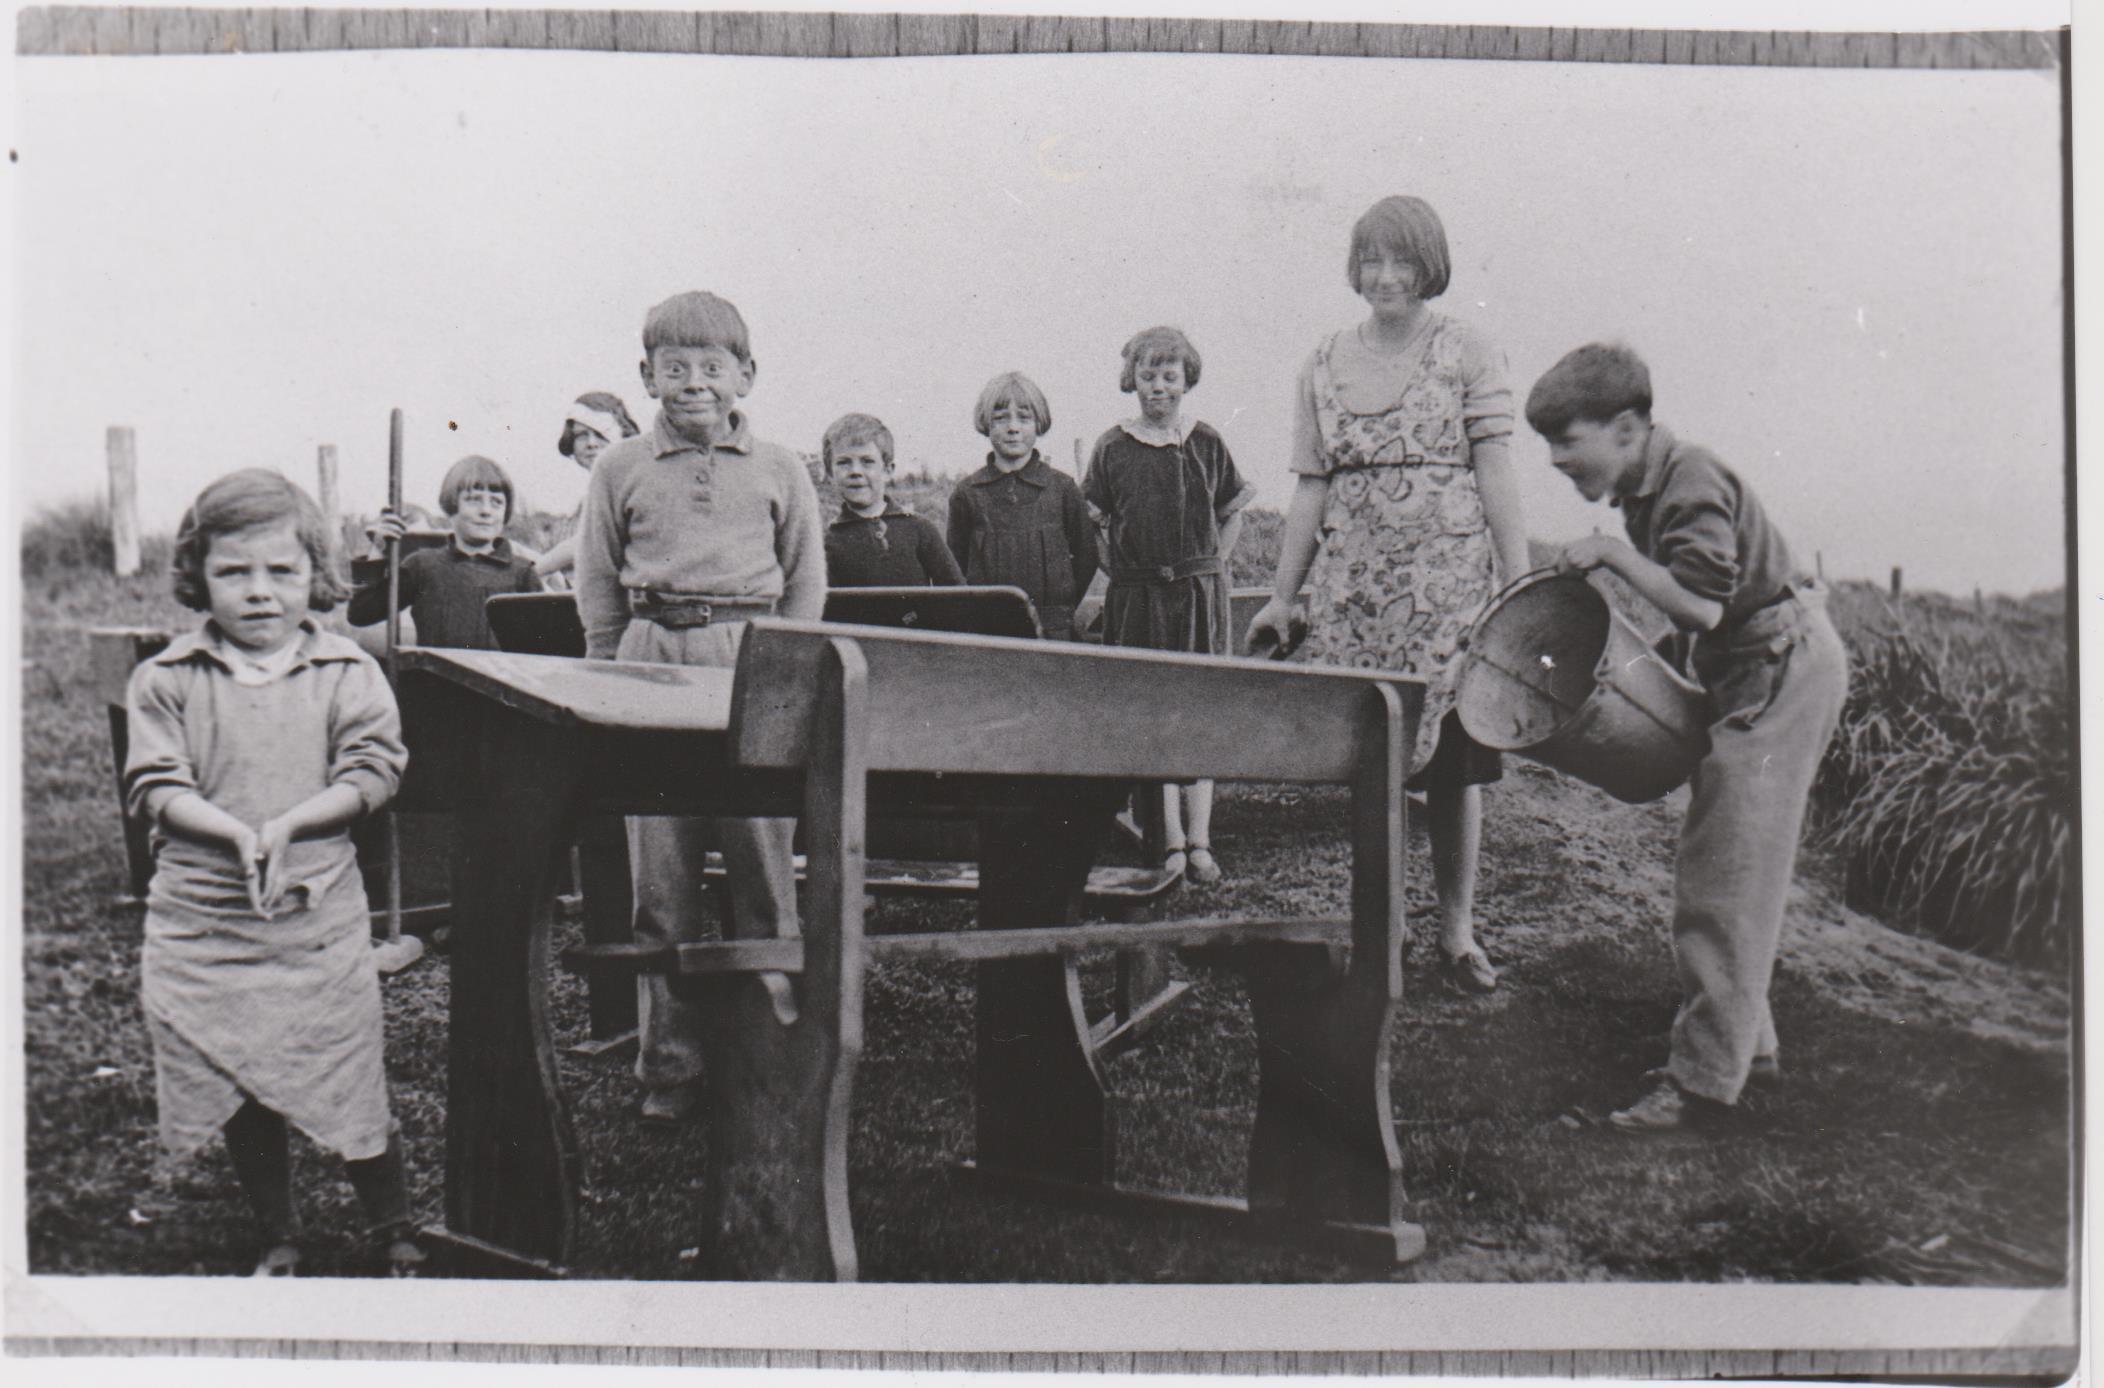 Cape Otway schoolchildren cleaning desks 1930's